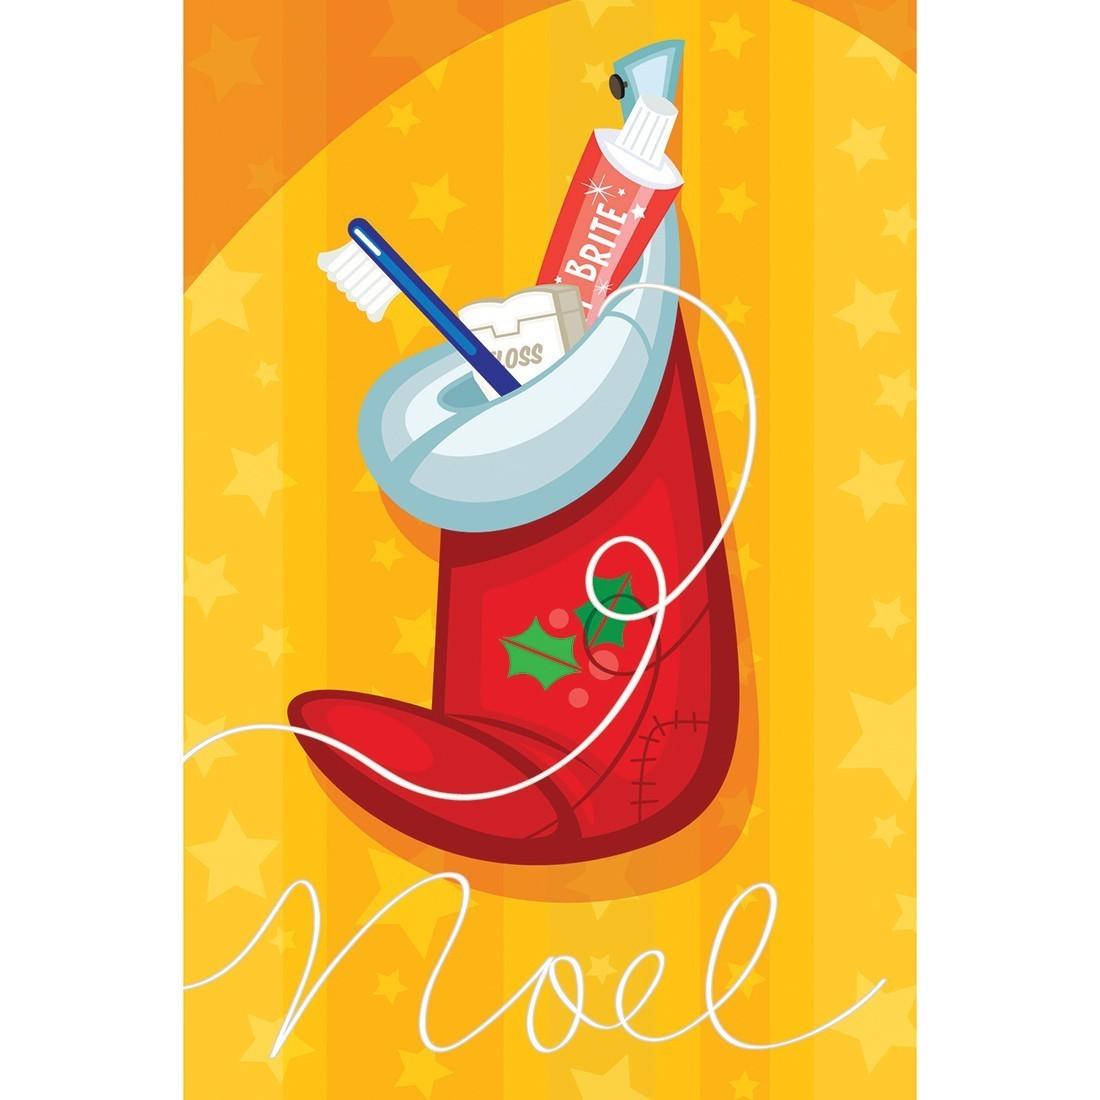 Dental Noel Stocking Greeting Cards [image]